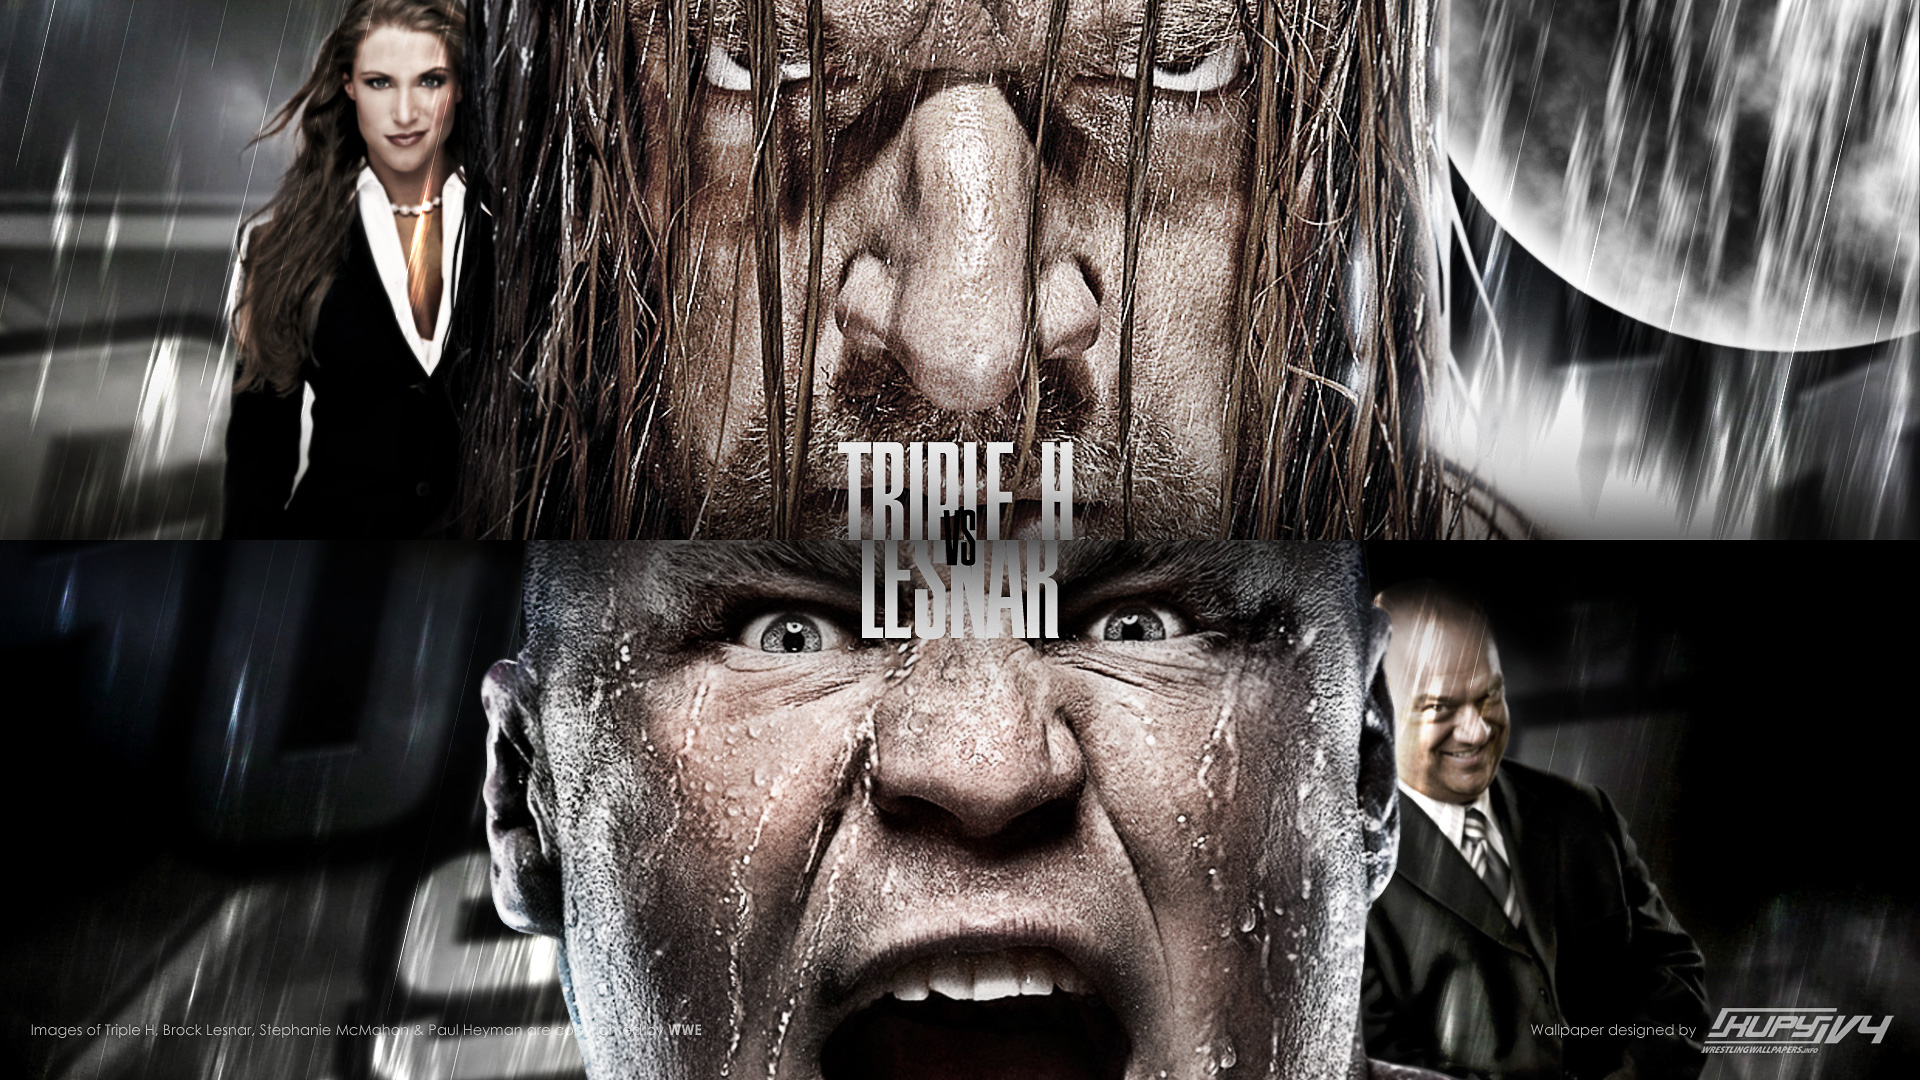 Brock Lesnar Hd Wallpaper Kupywrestlingwallpapers Info The Newest Wrestling